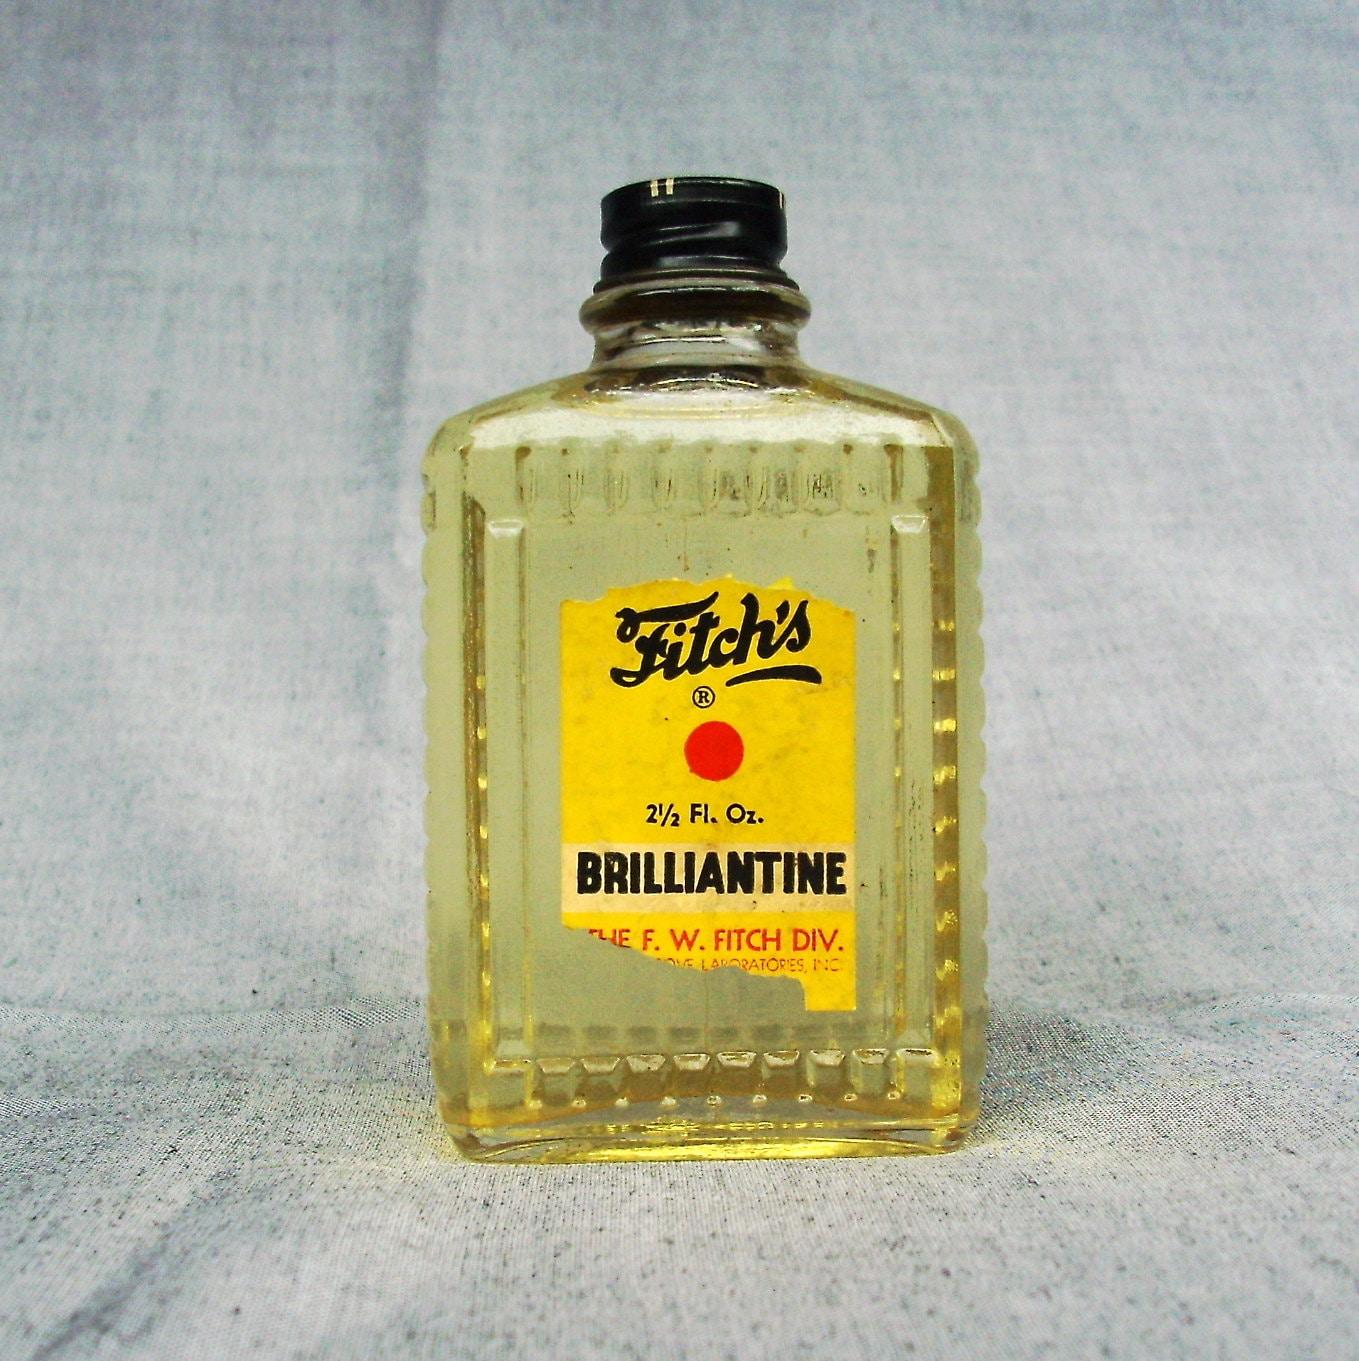 Vintage bottle fitch 39 s brilliantine never opened for Pitture brillantinate